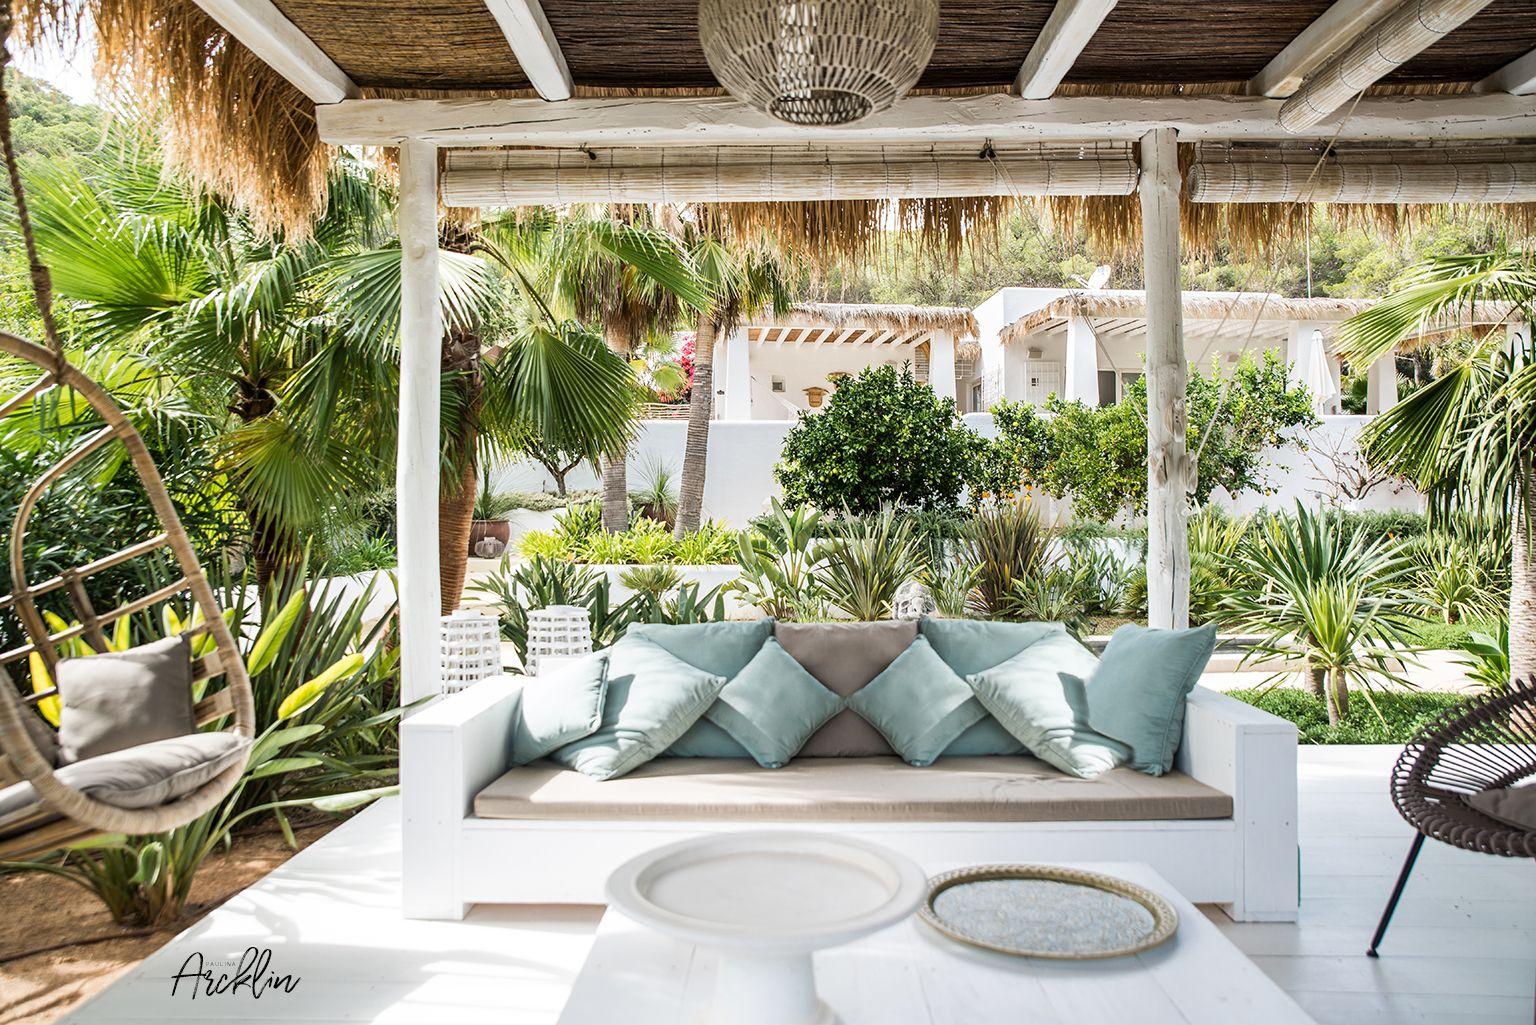 PURE HOUSE IBIZA | Ibiza, Terrace design and House